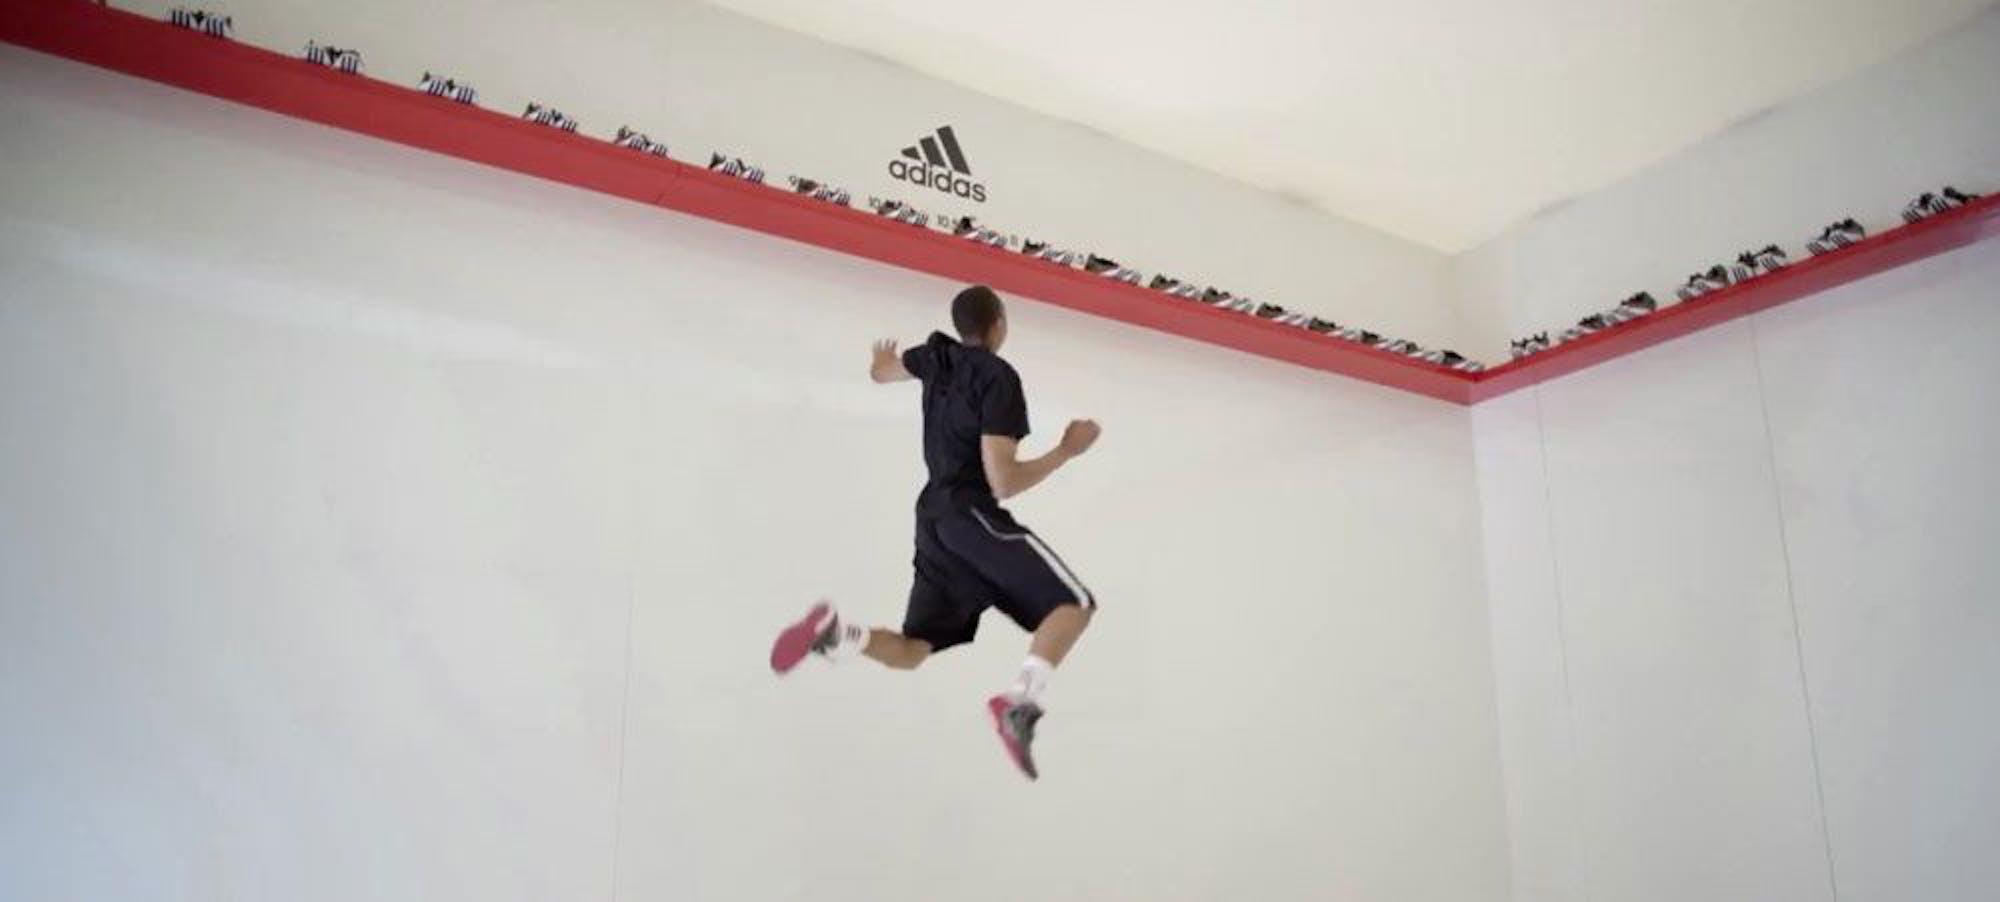 Derrick Rose - Adidas campaign